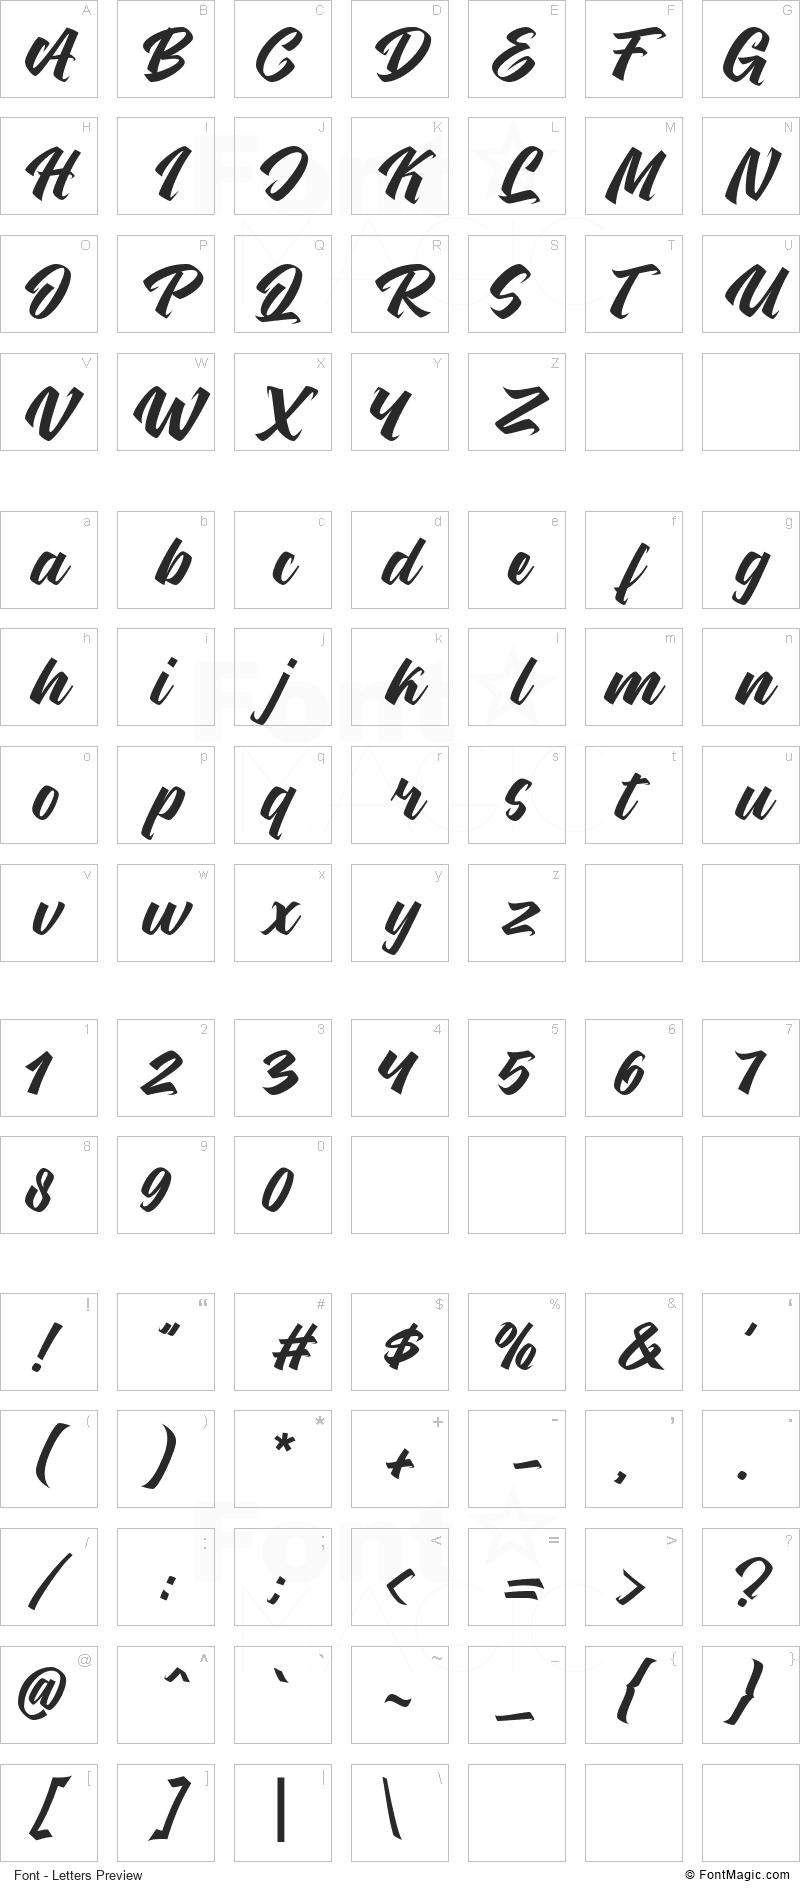 Kenthir Font - All Latters Preview Chart